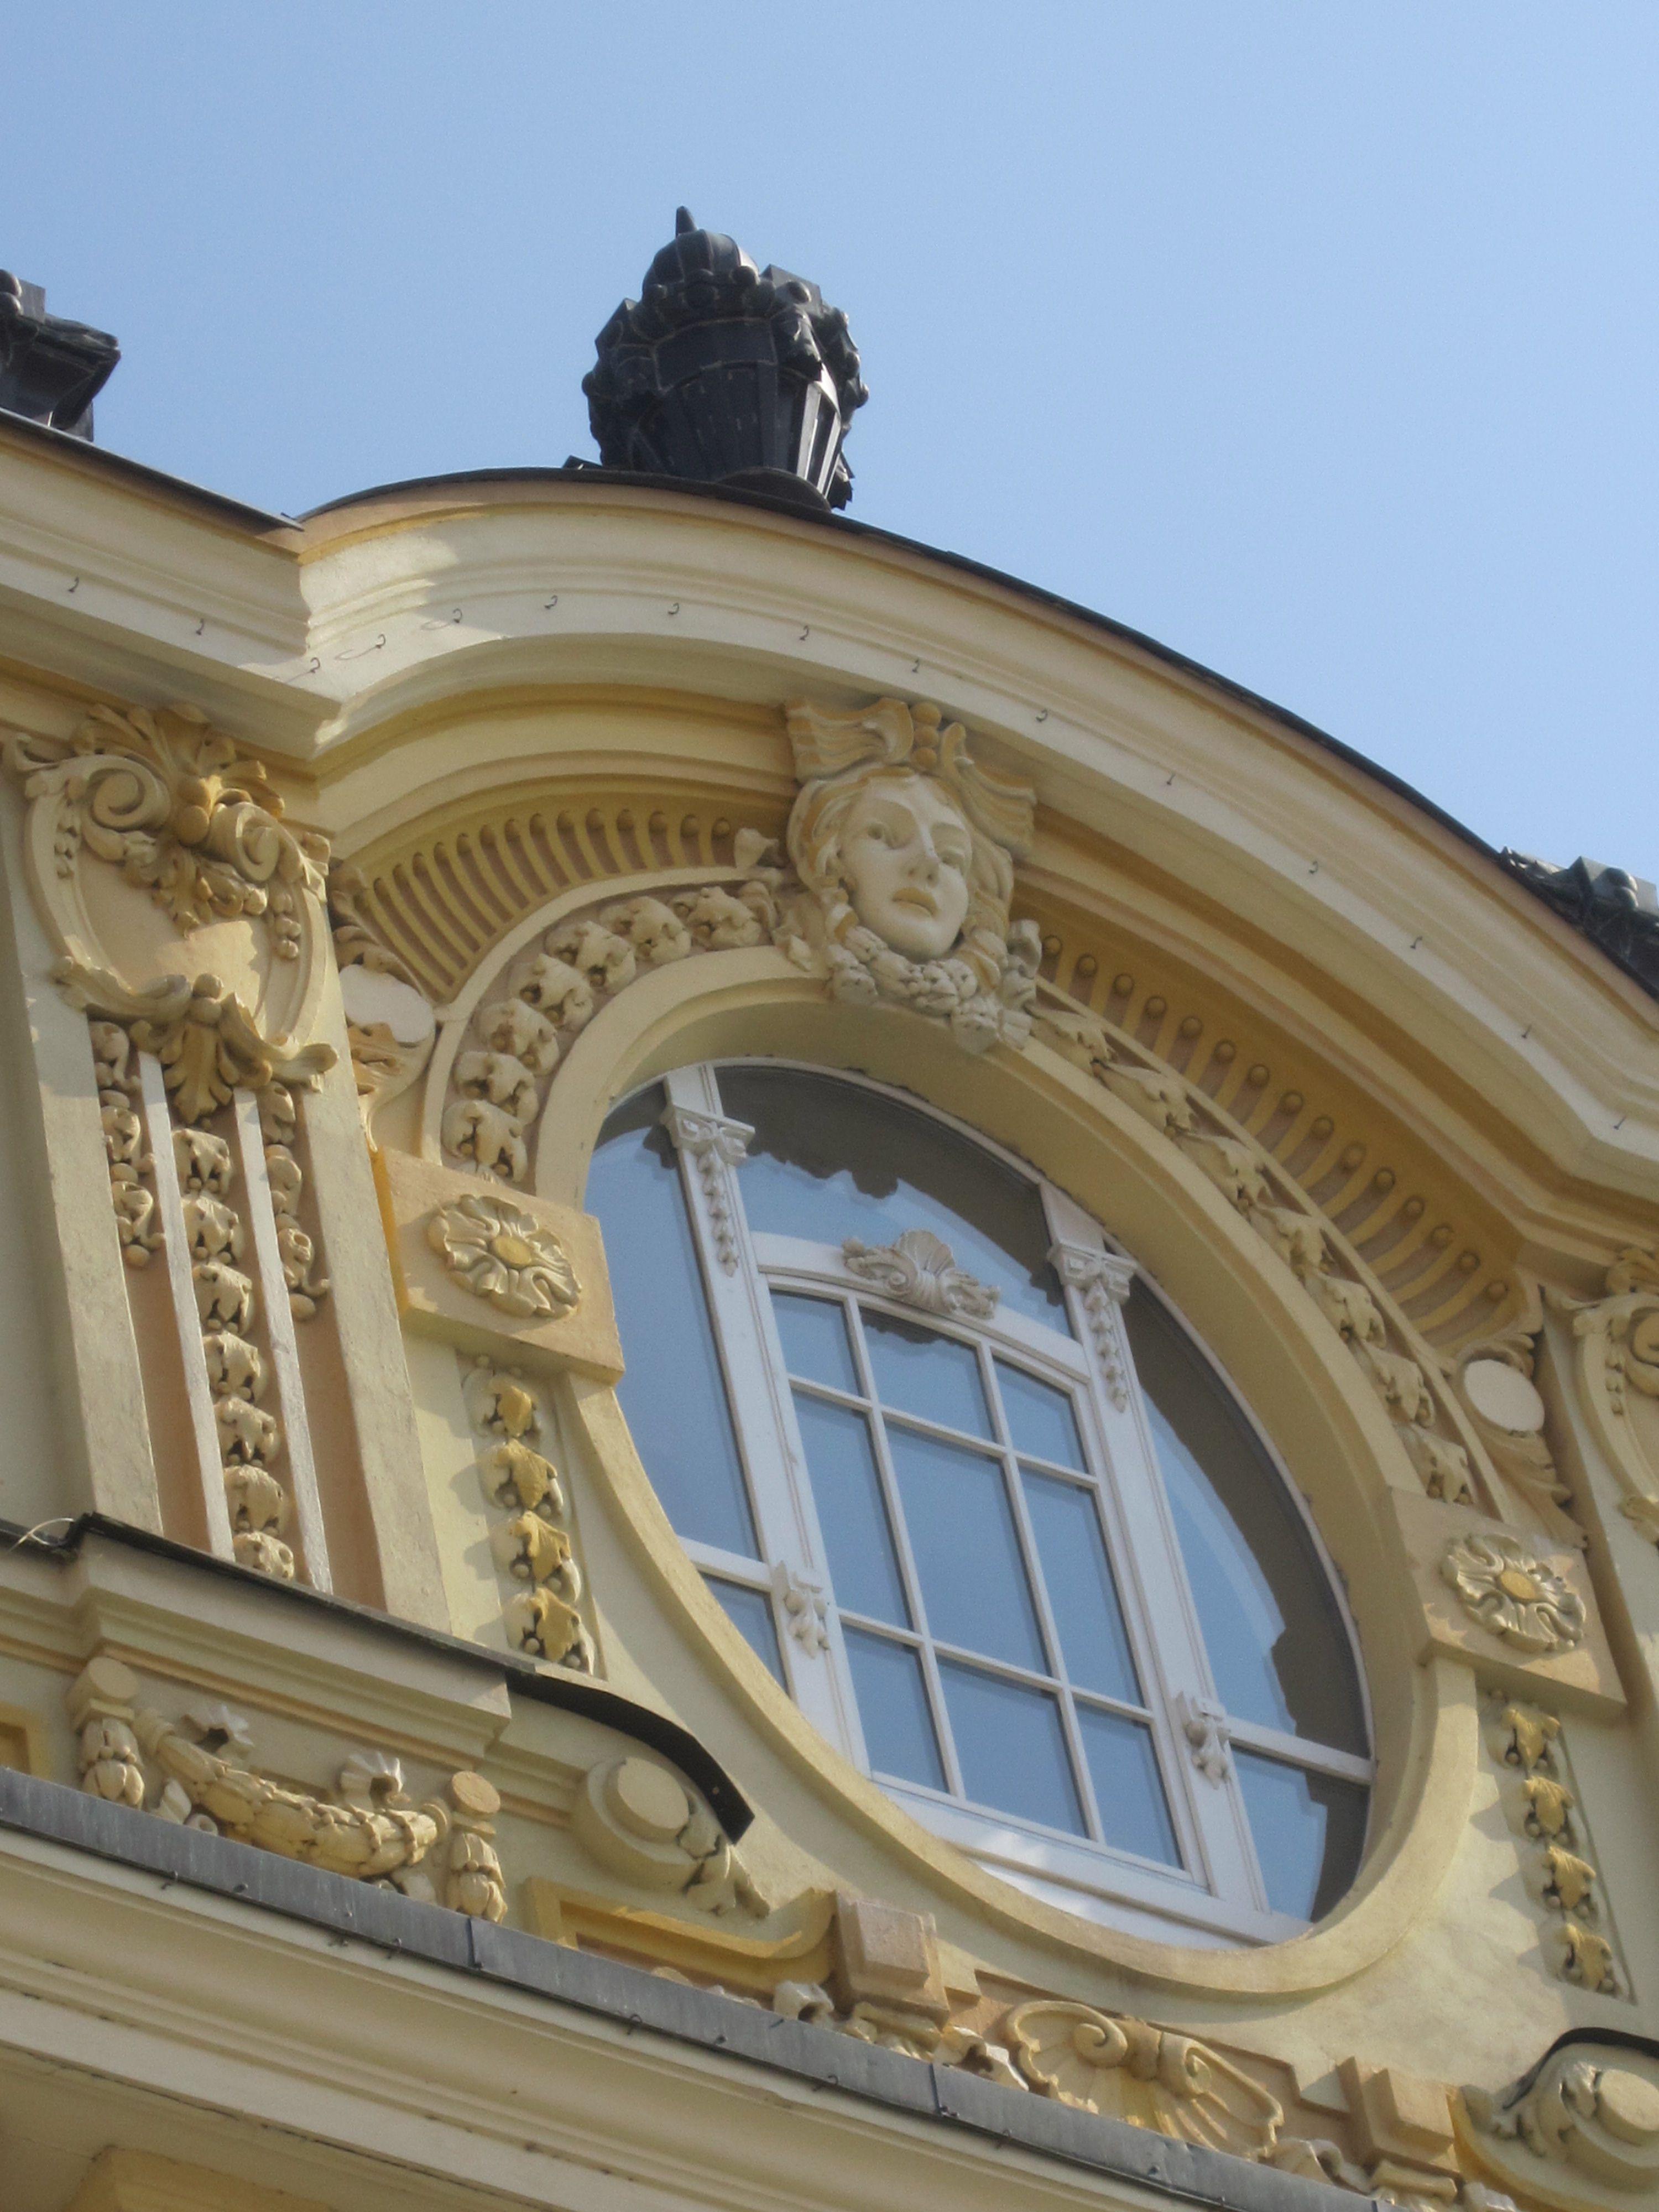 Old building window decoration